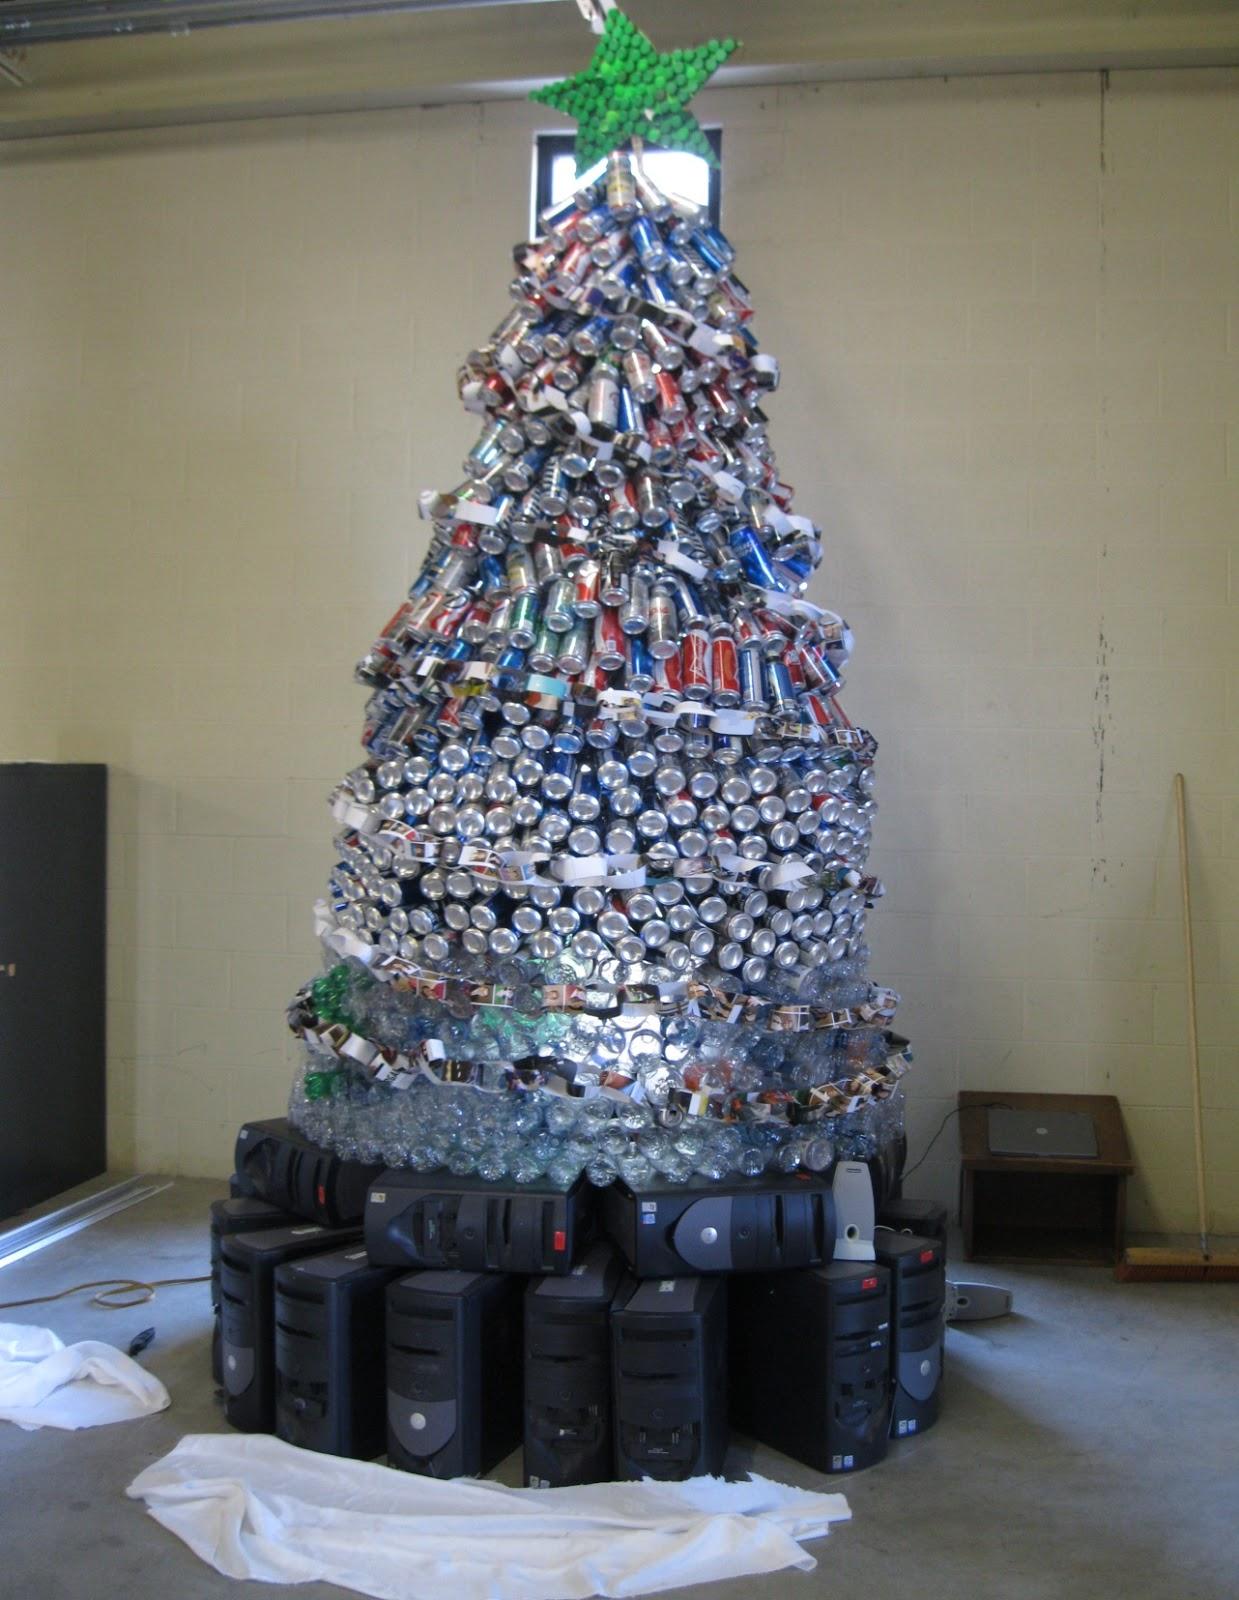 WKU Recycling & Surplus